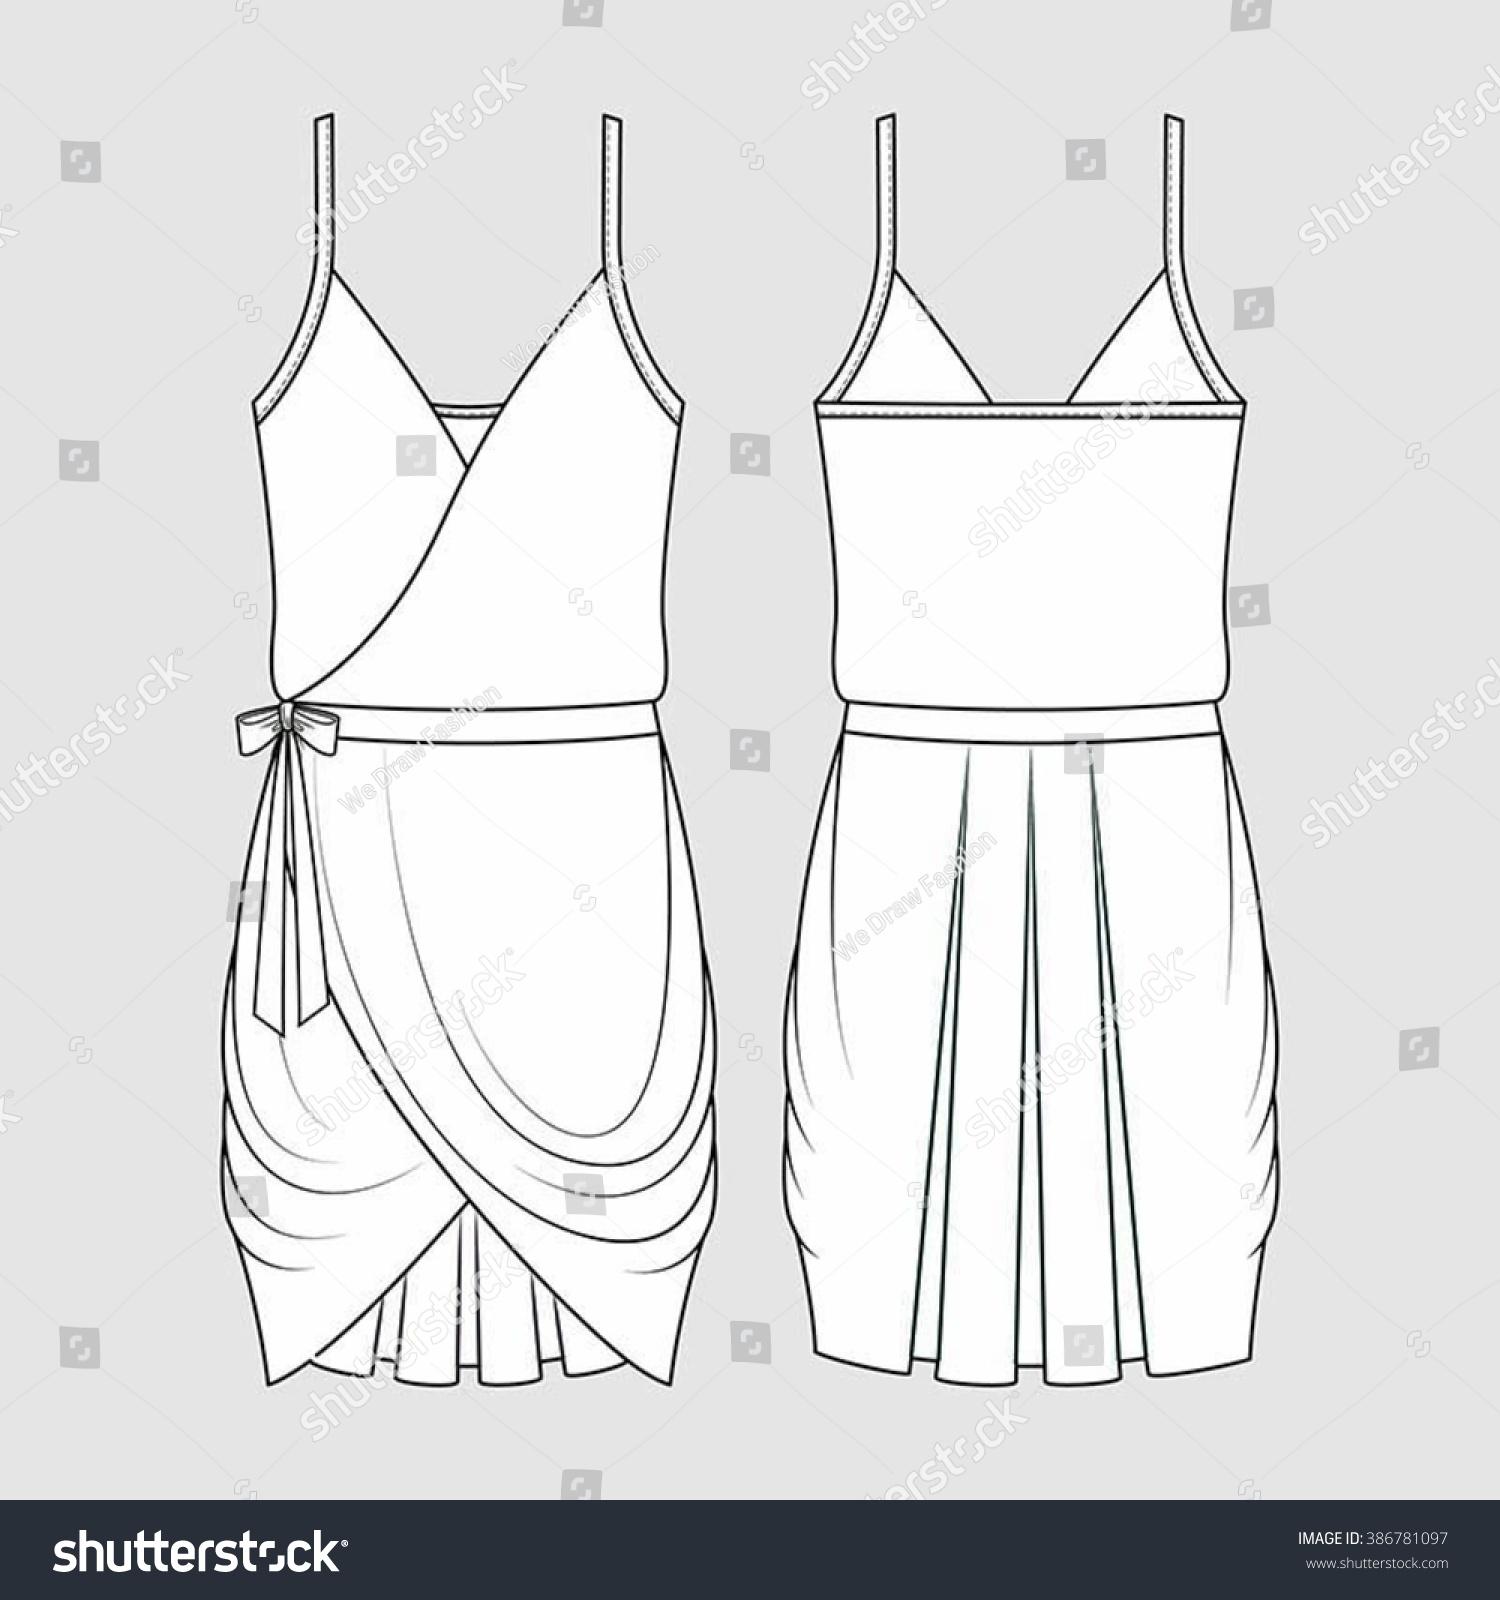 Draped Formal Dress Fashion Illustration Cad Stock Vector Royalty Free 386781097